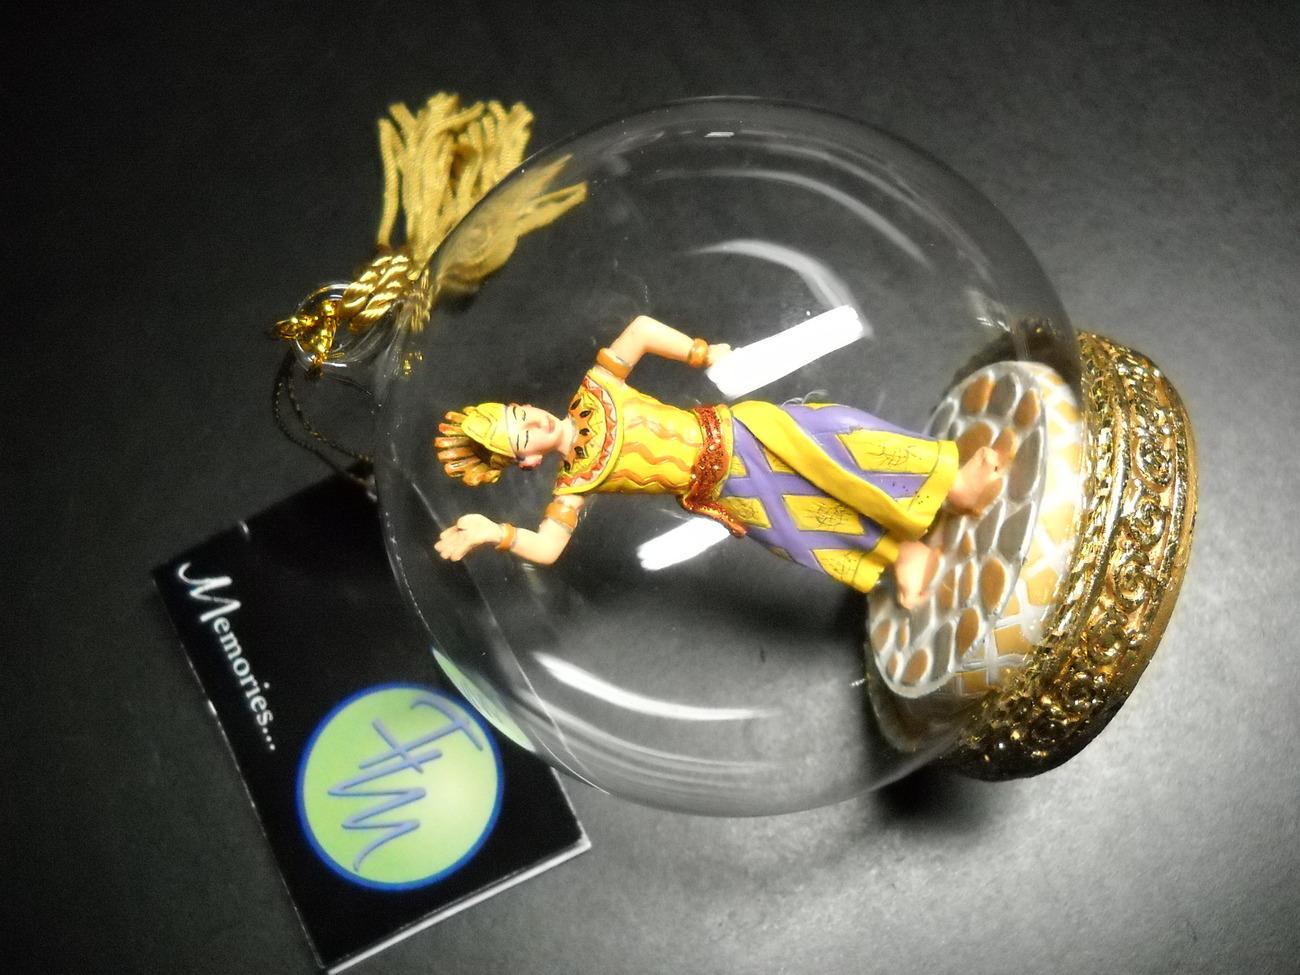 Flavia Milano Memory Globe 2007 Bali World Collection Original Presentation Box